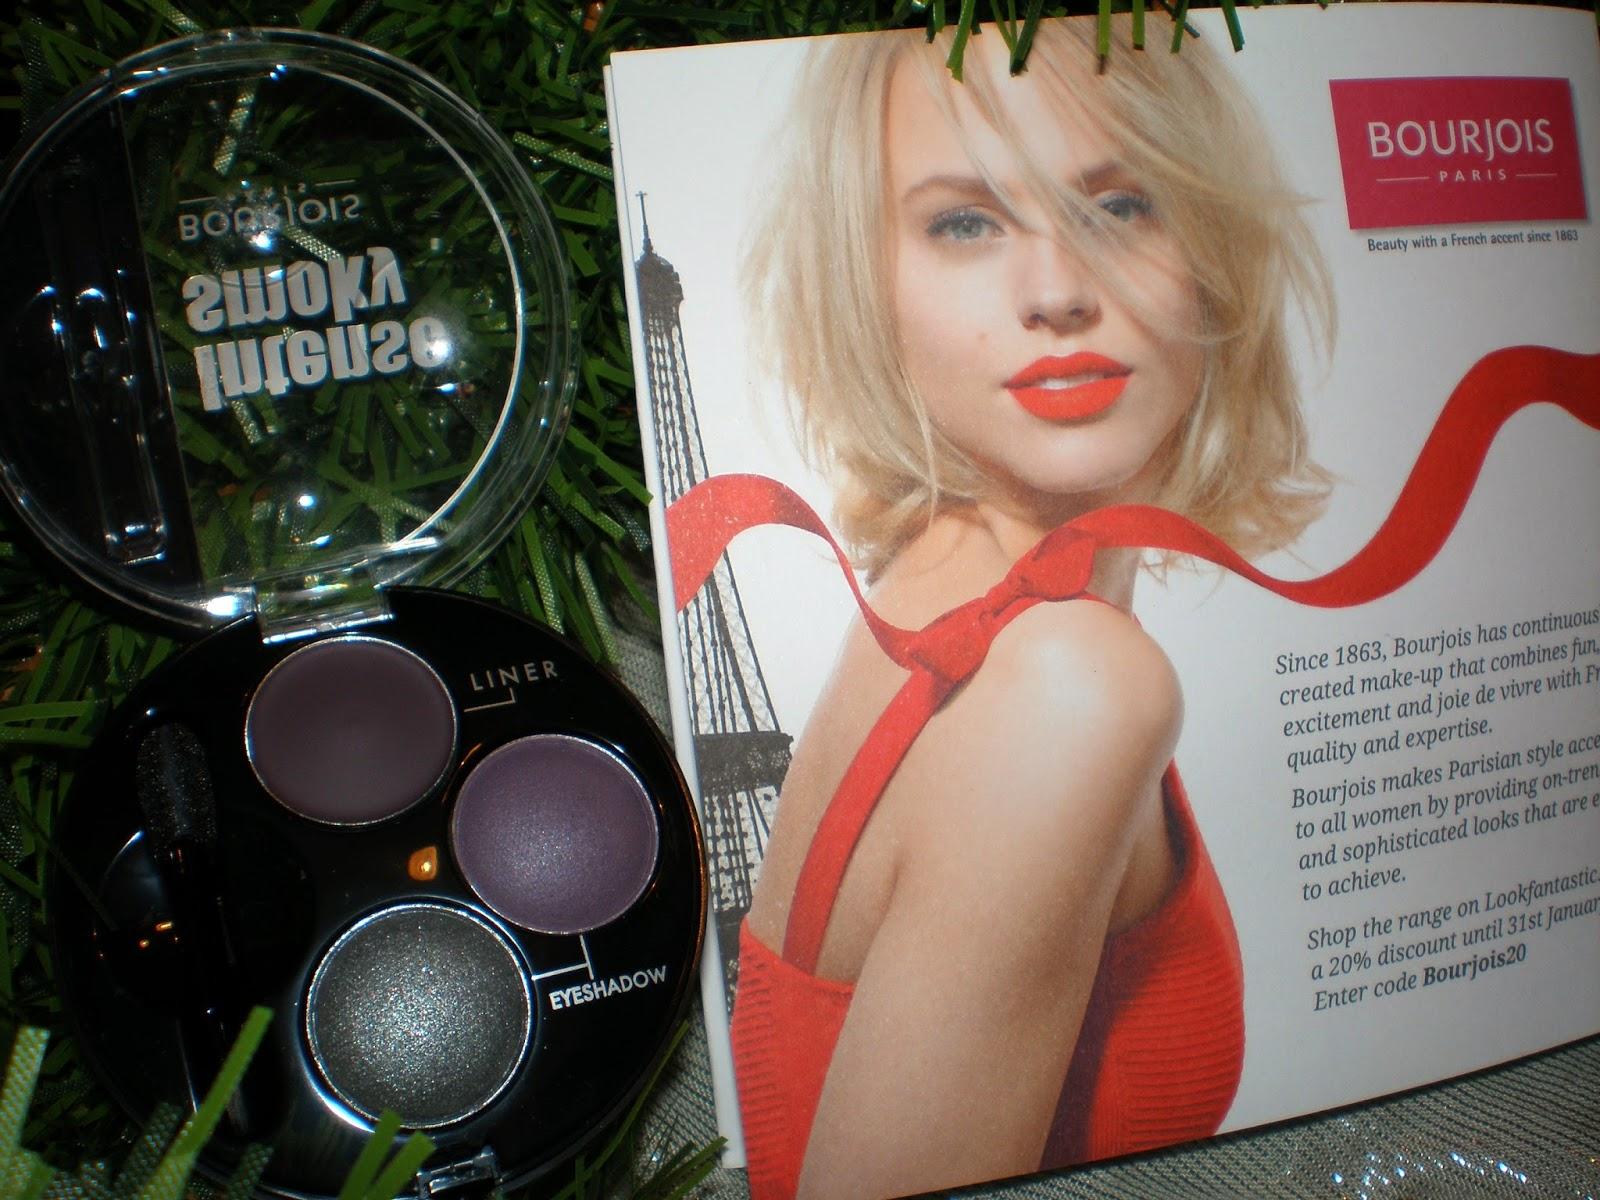 Bourjois Paris Intense Smoky Eyeshadow & Liner in Violet Constelle